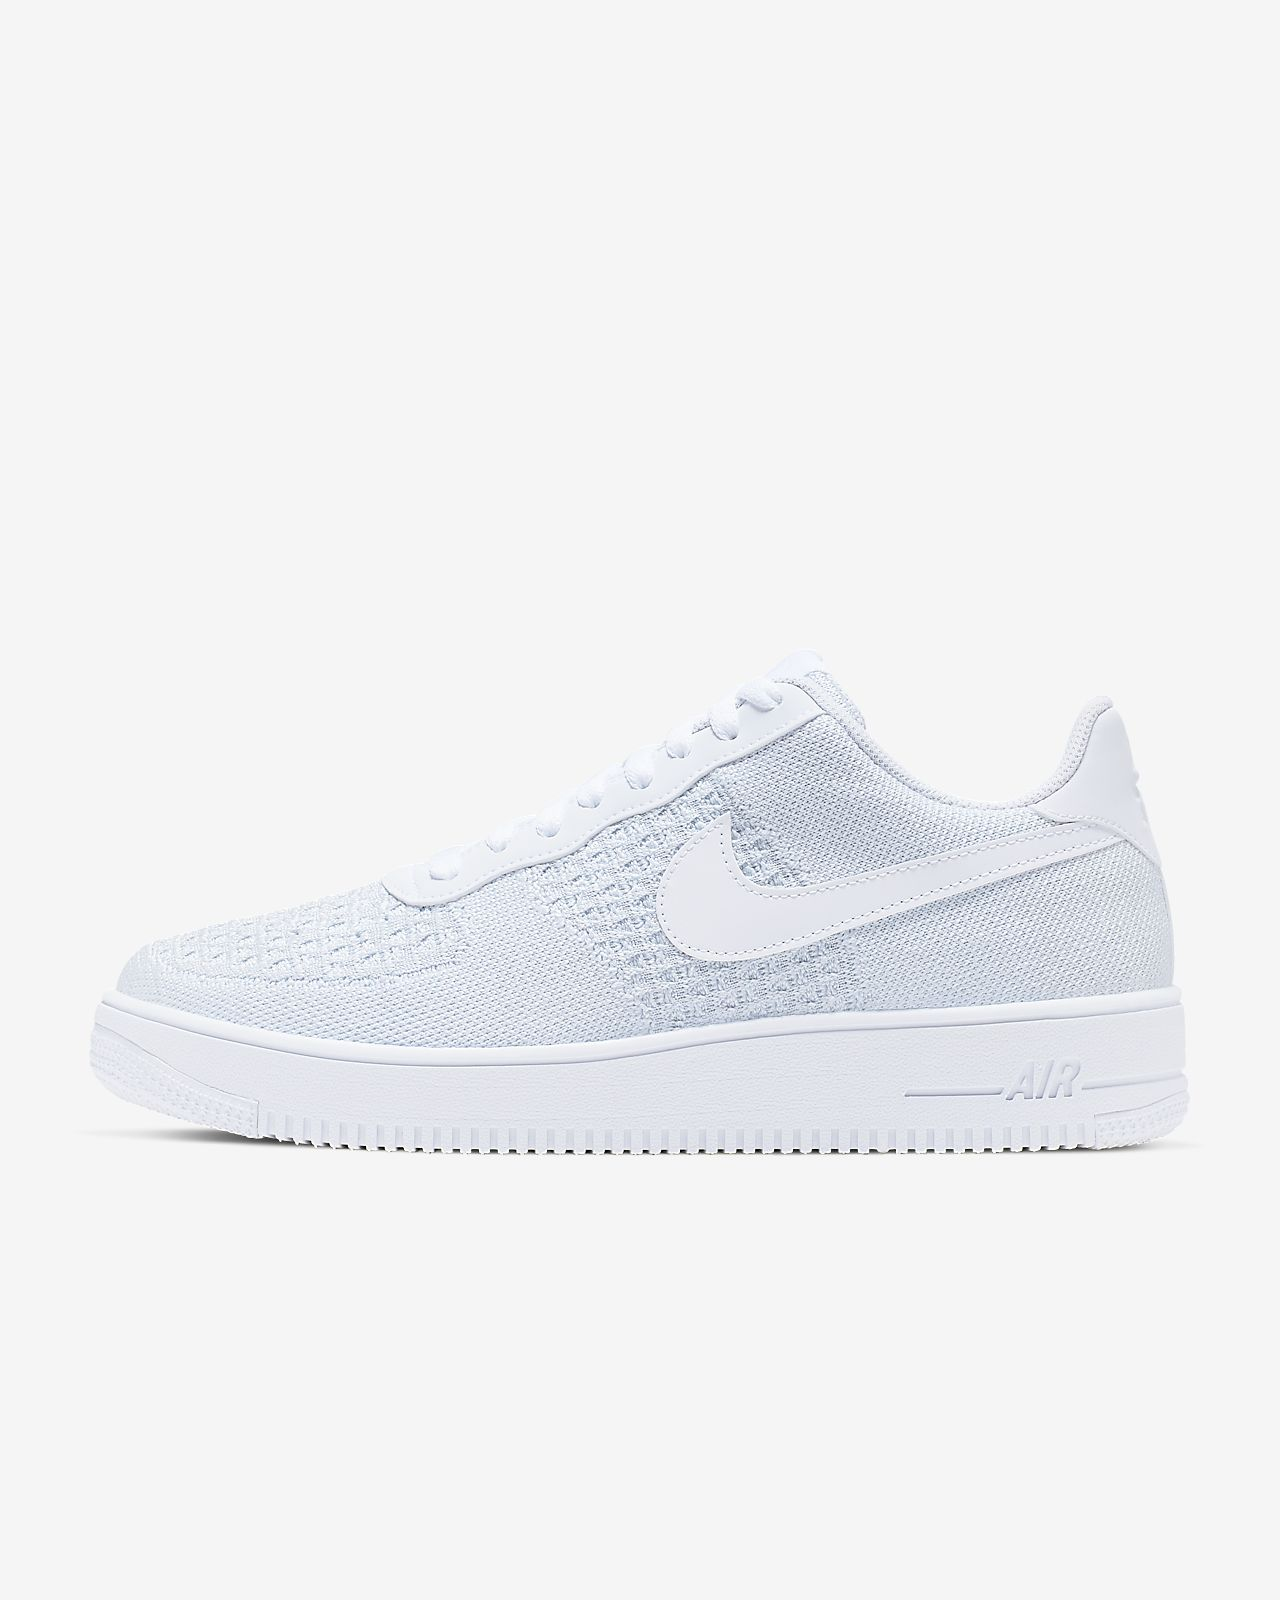 Nike AIR FORCE 1 FLYKNIT 2.0 'Oreo'   AV3042 001   Buty